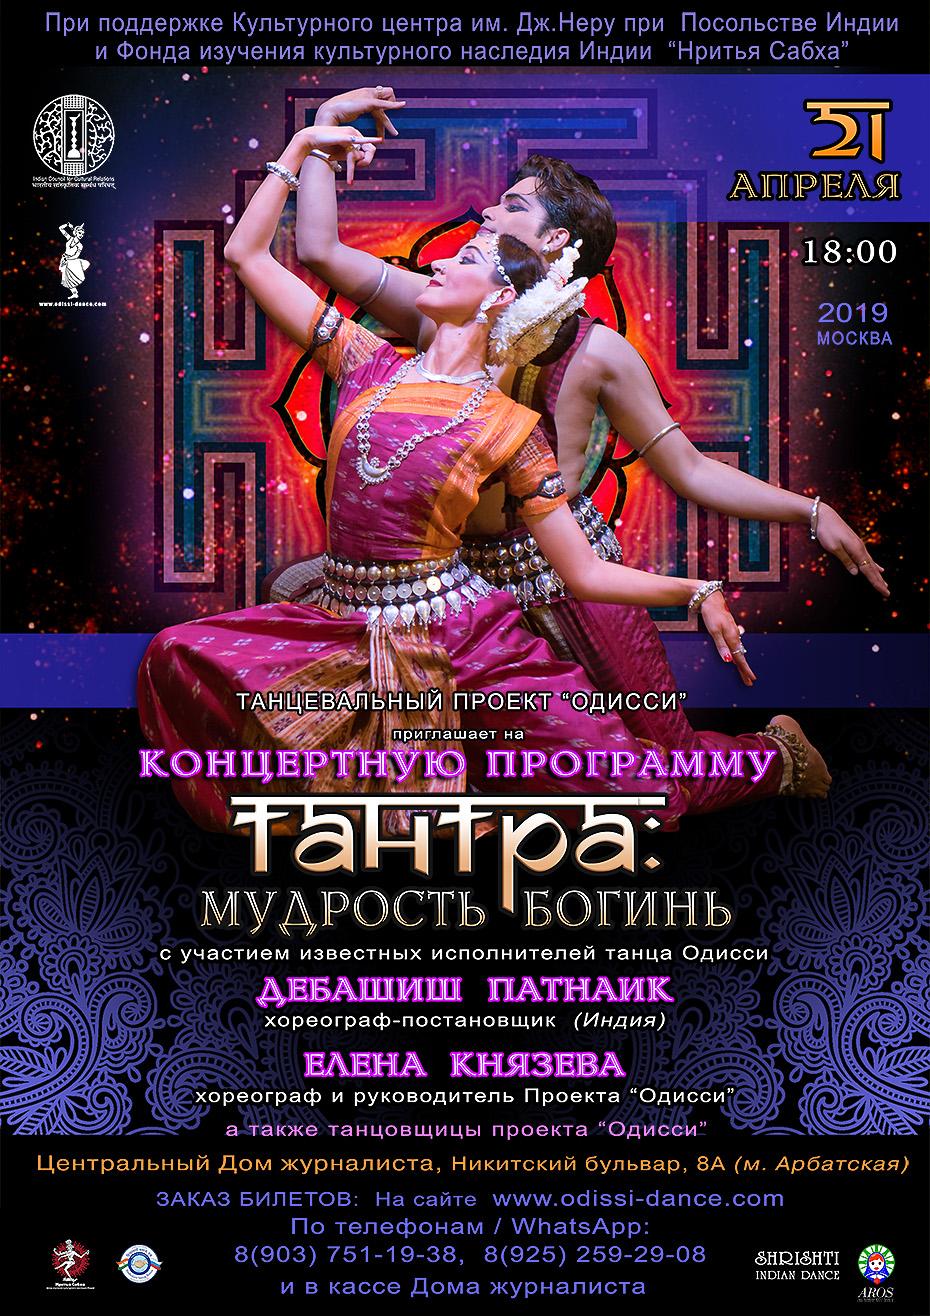 2019 концерт ИНТЕРНЕТ